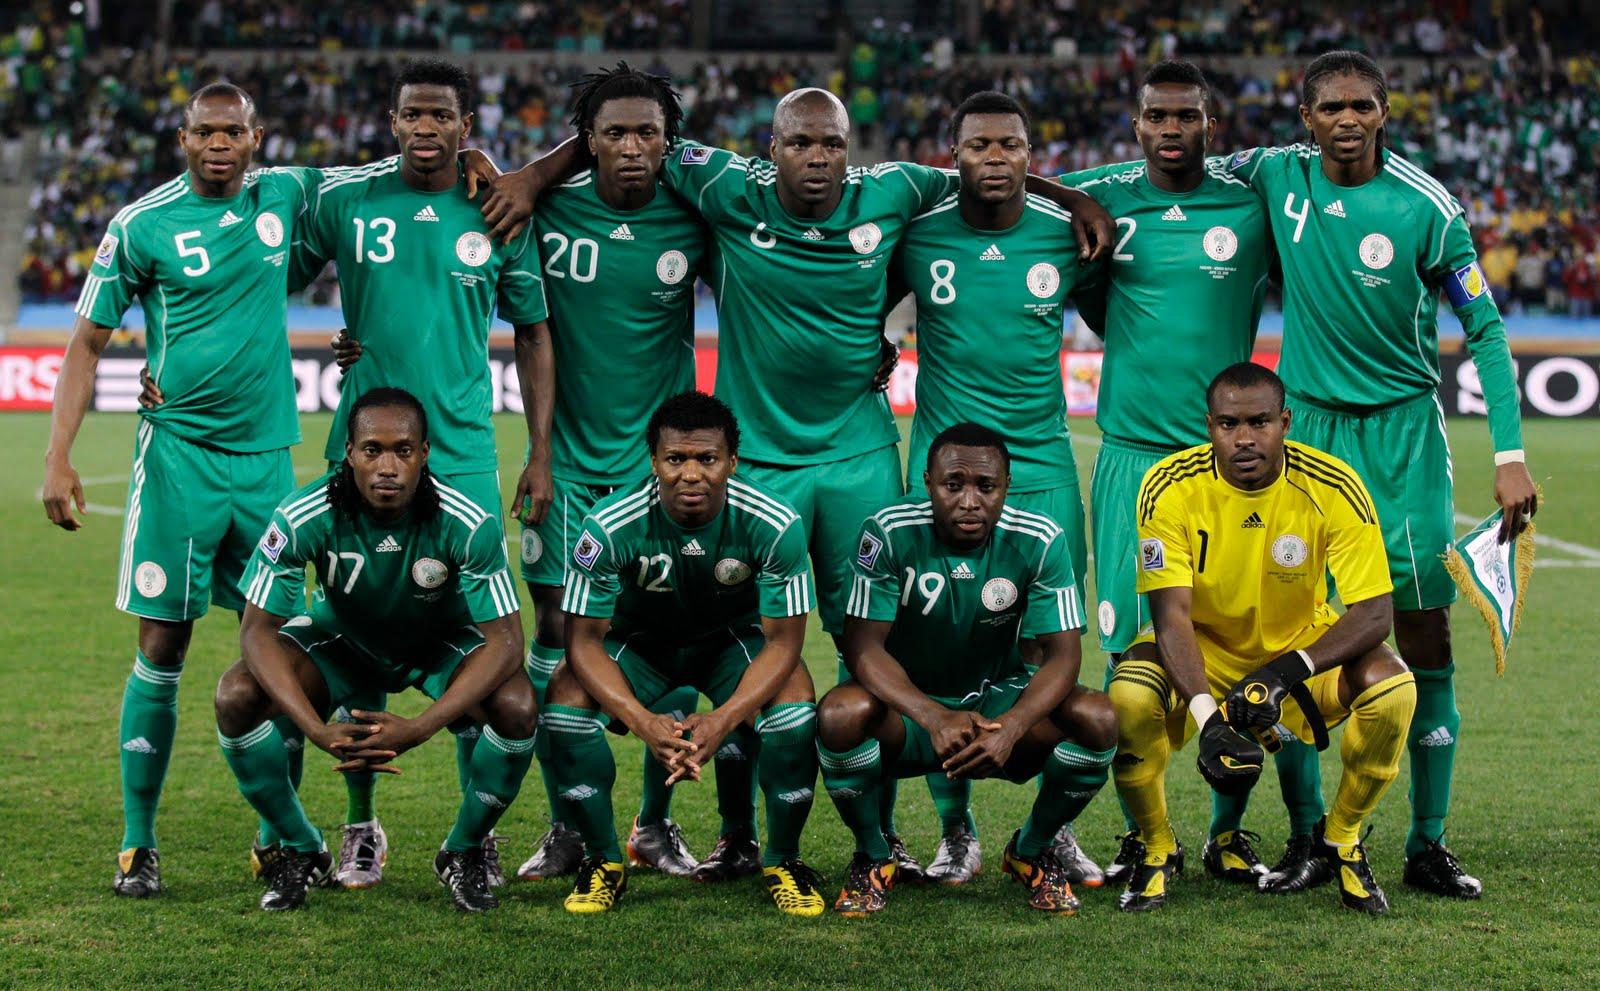 nigeria national football team 2012